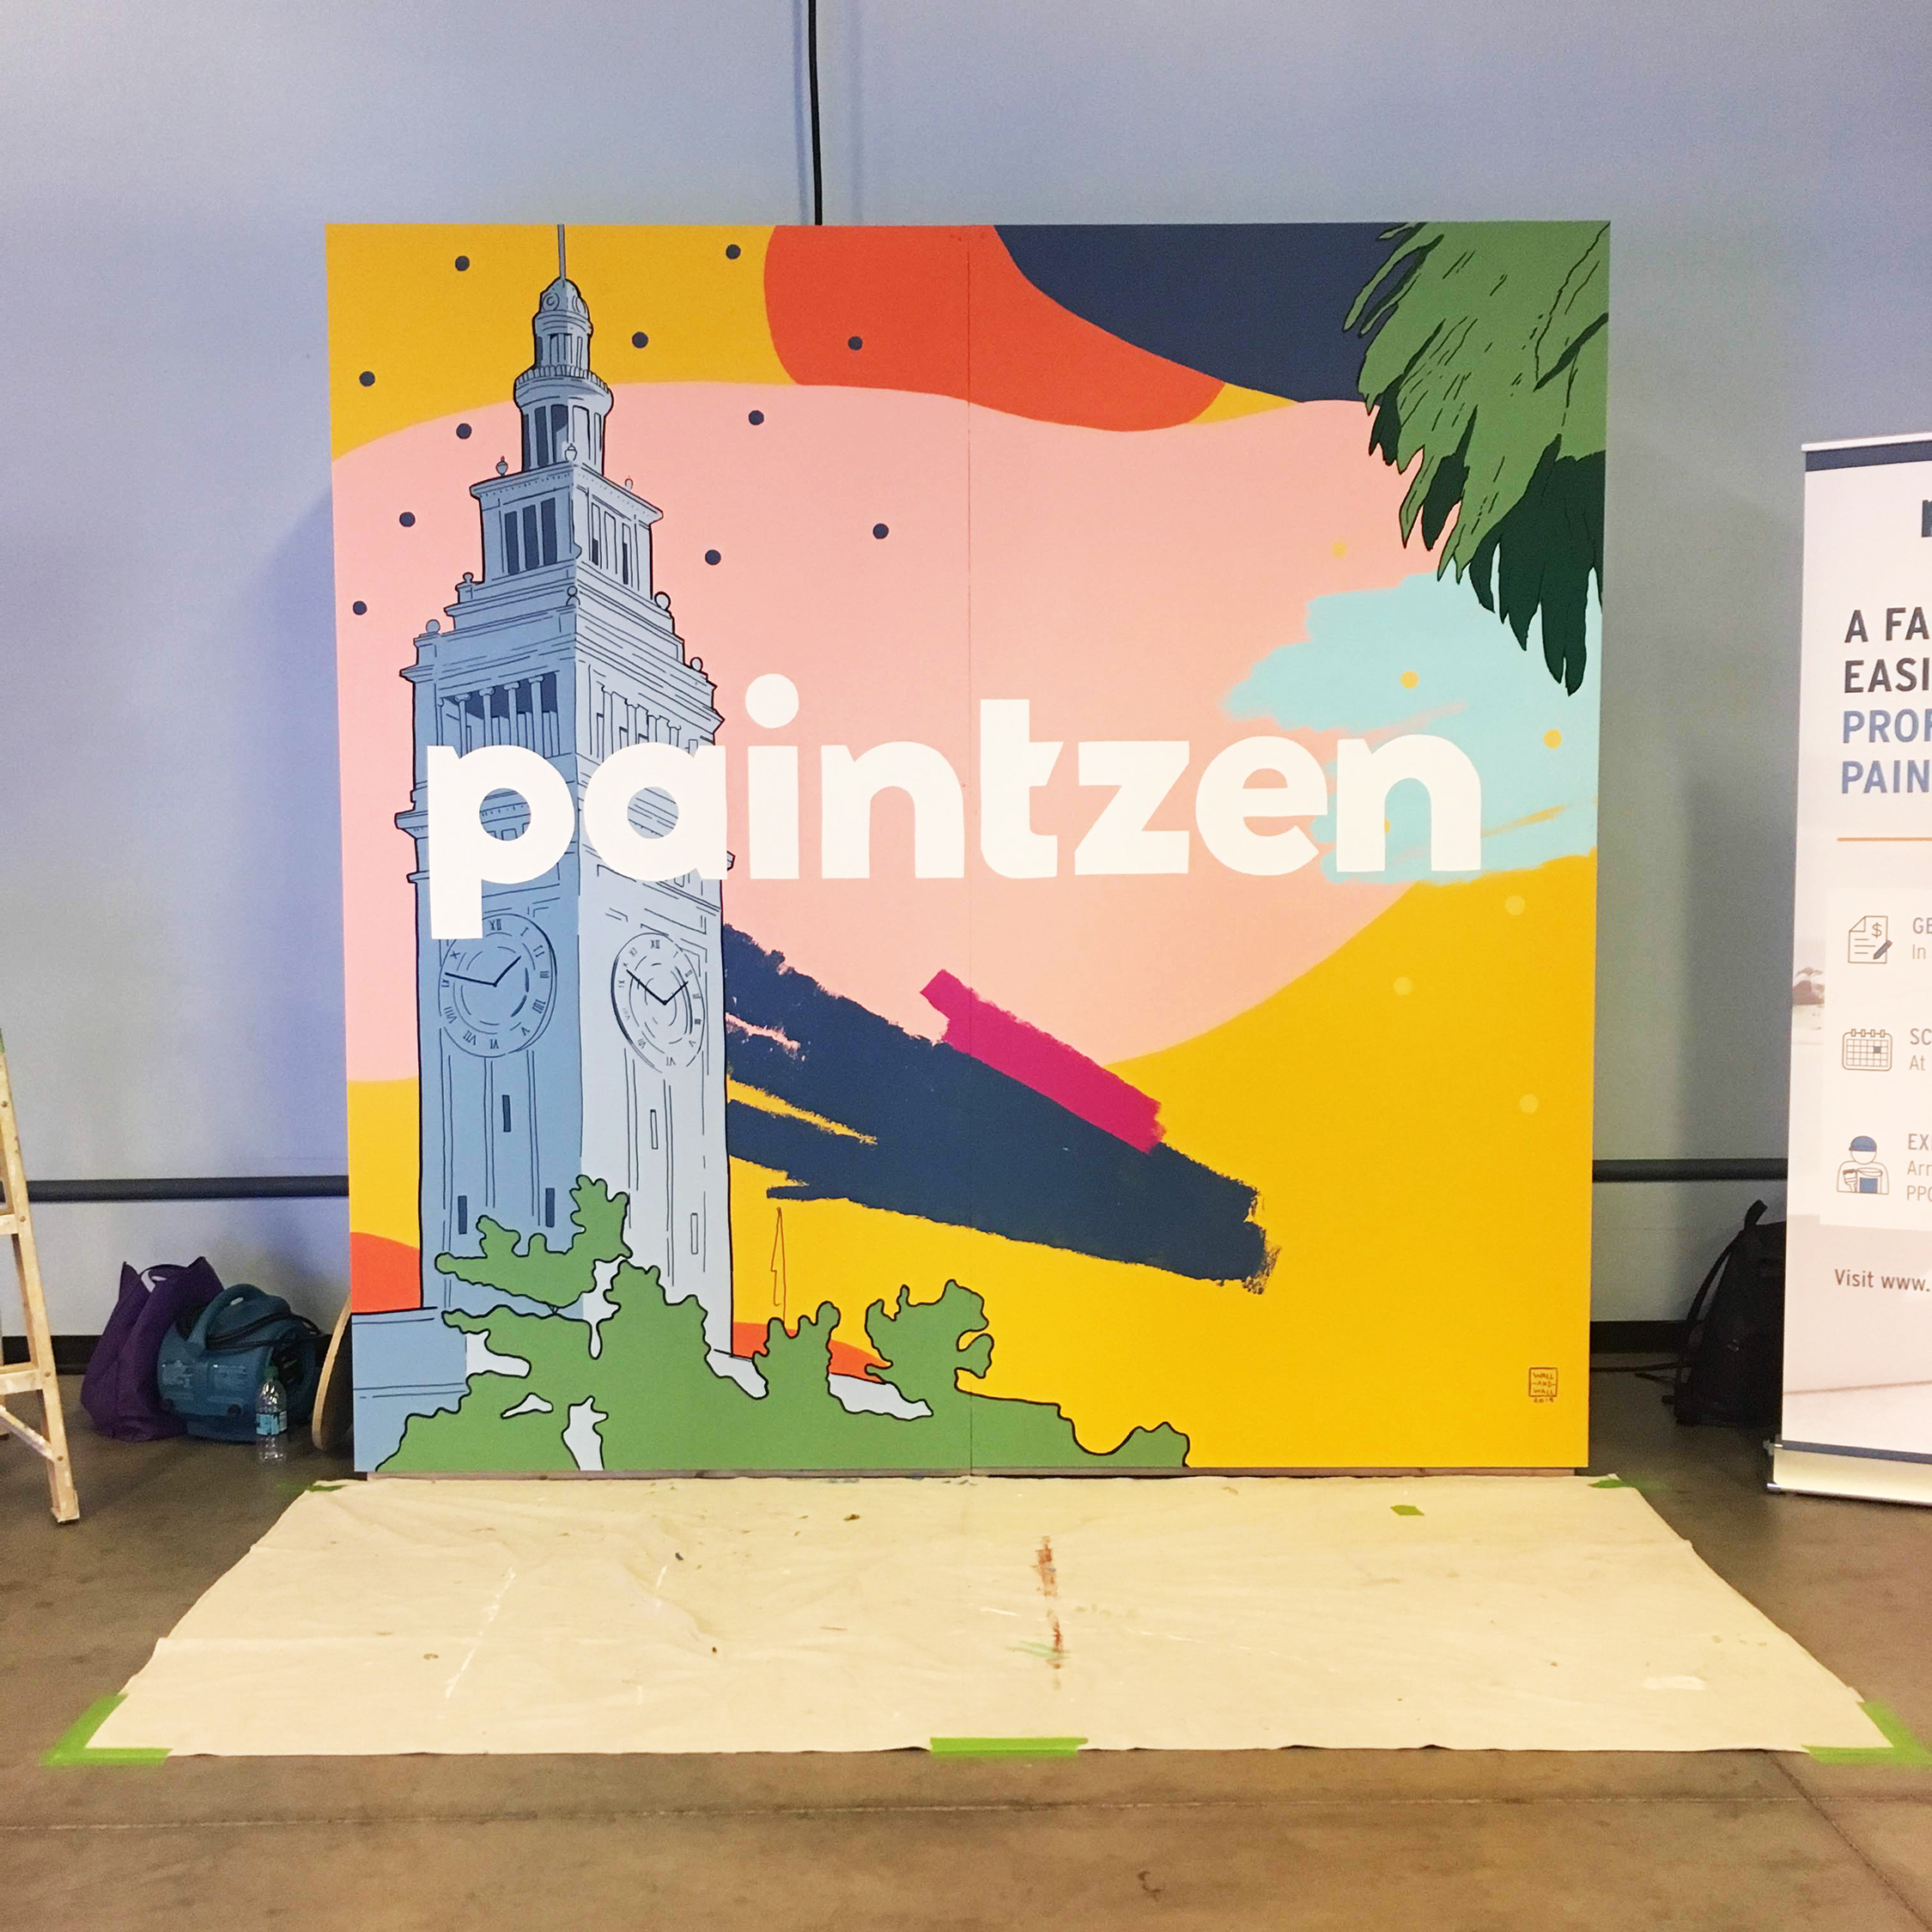 Copy of Paintzen - San Francisco, CA 2019